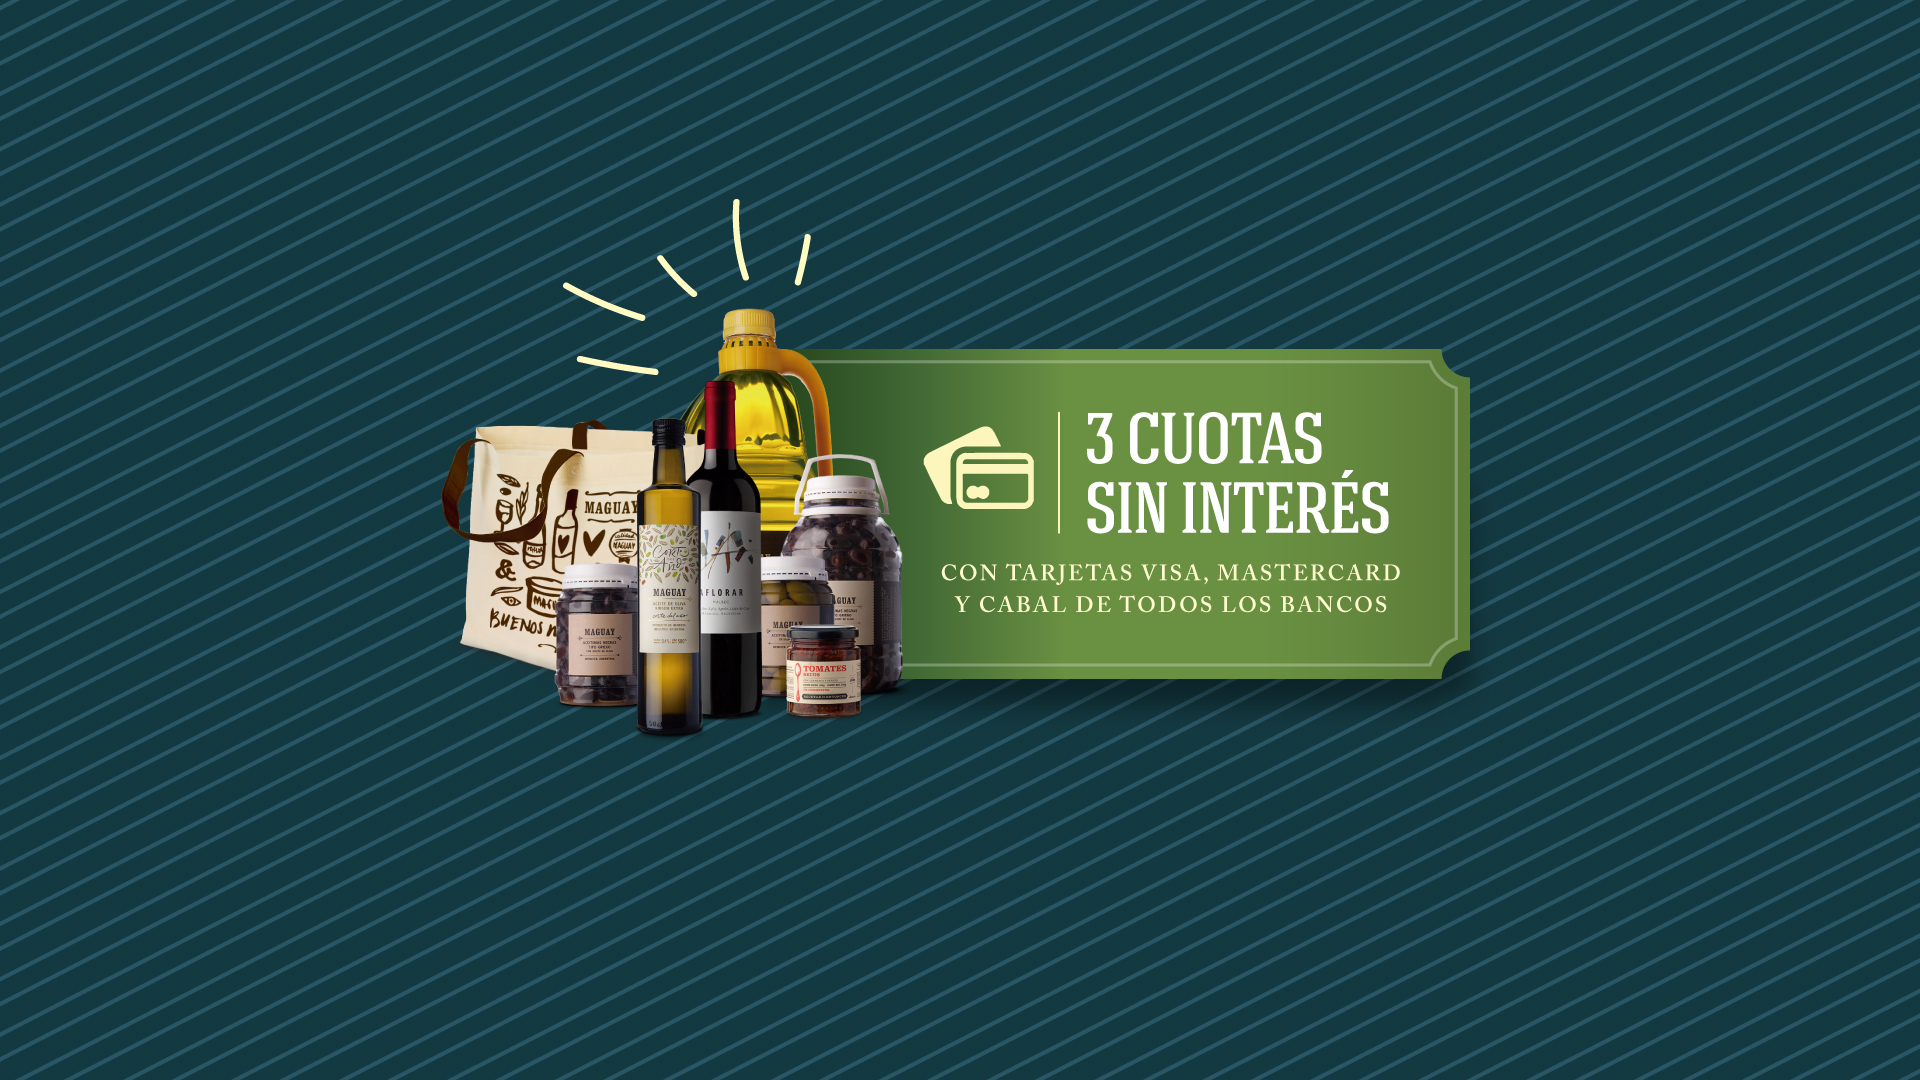 http://maguay.com.ar/es/tienda